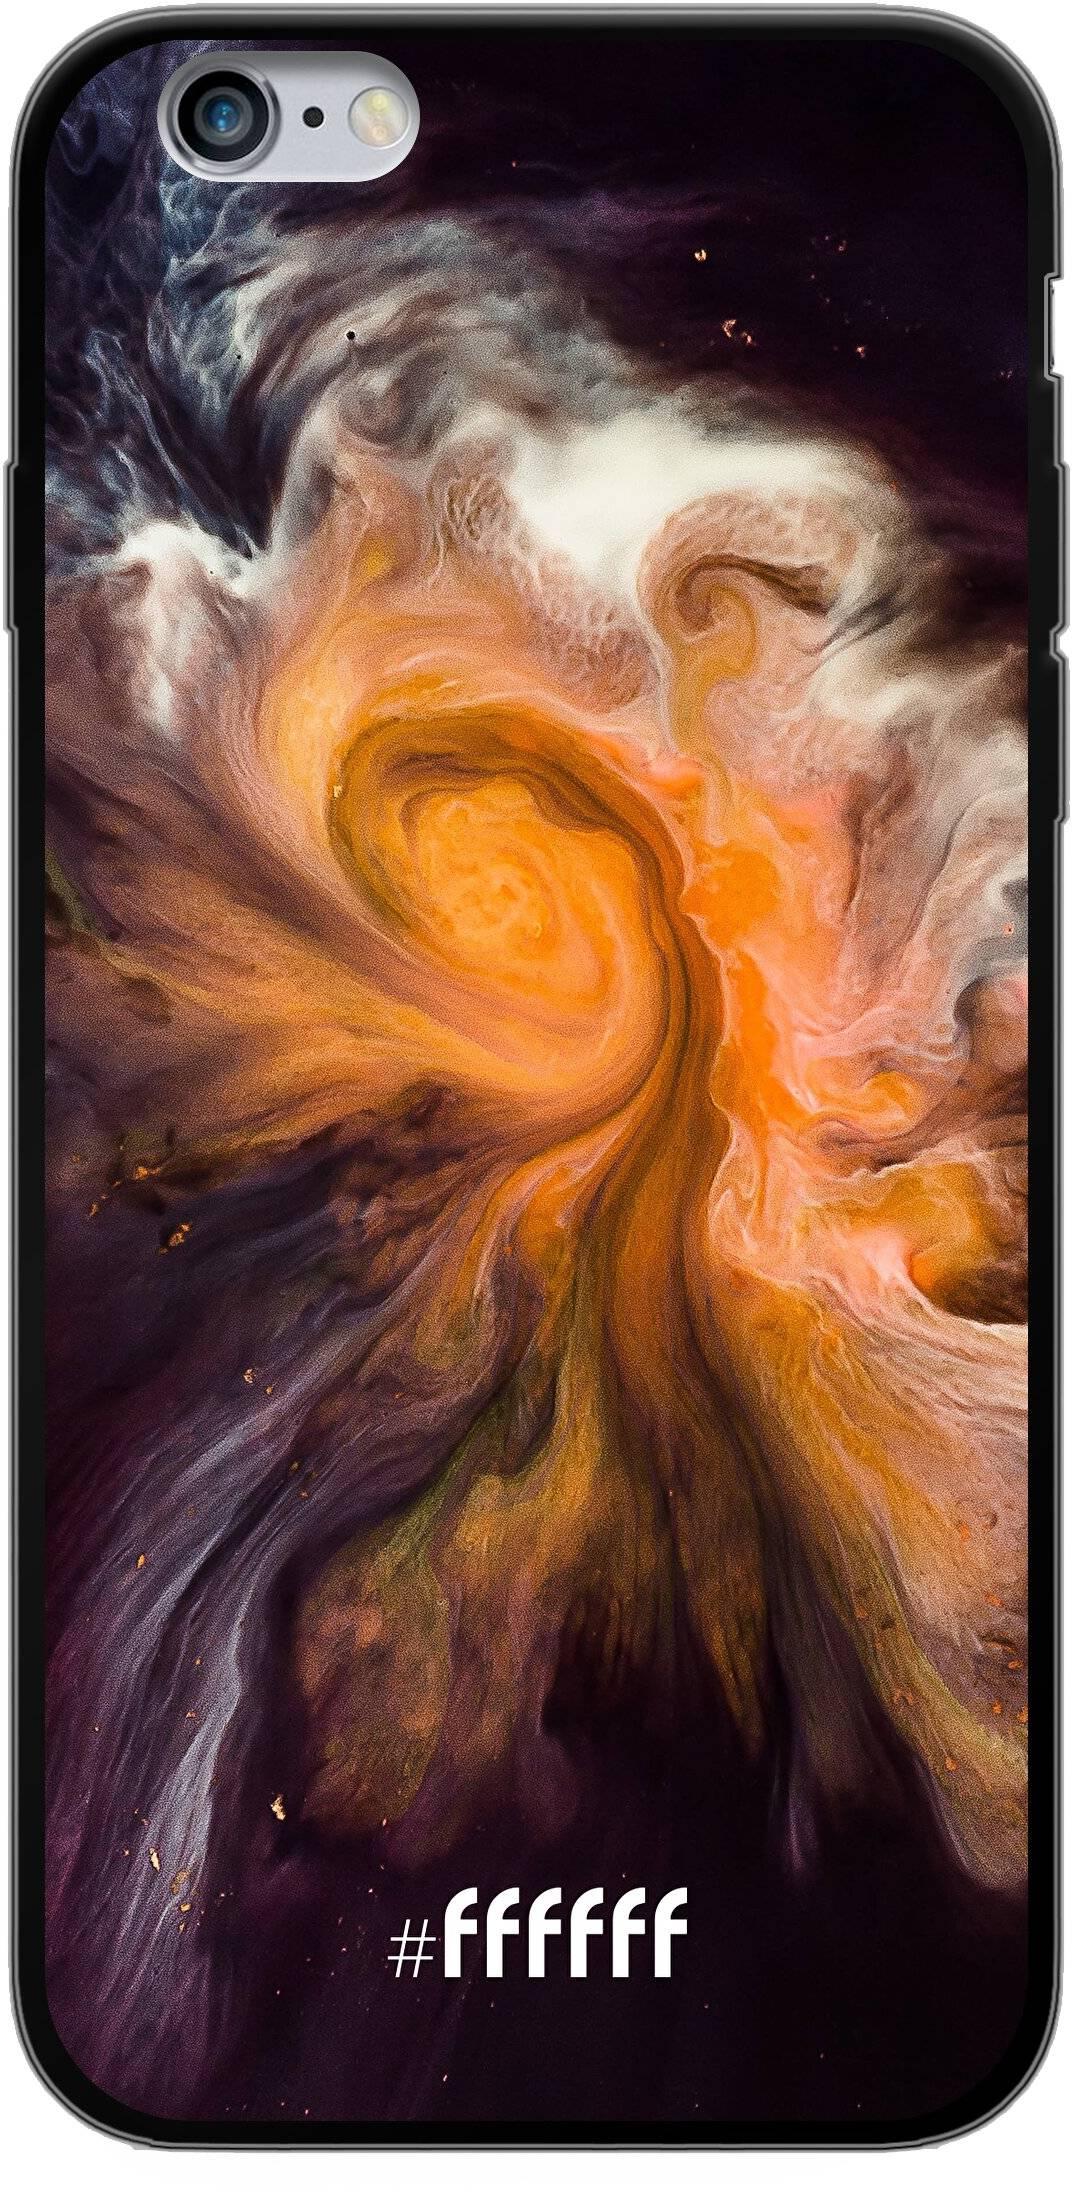 Crazy Space iPhone 6